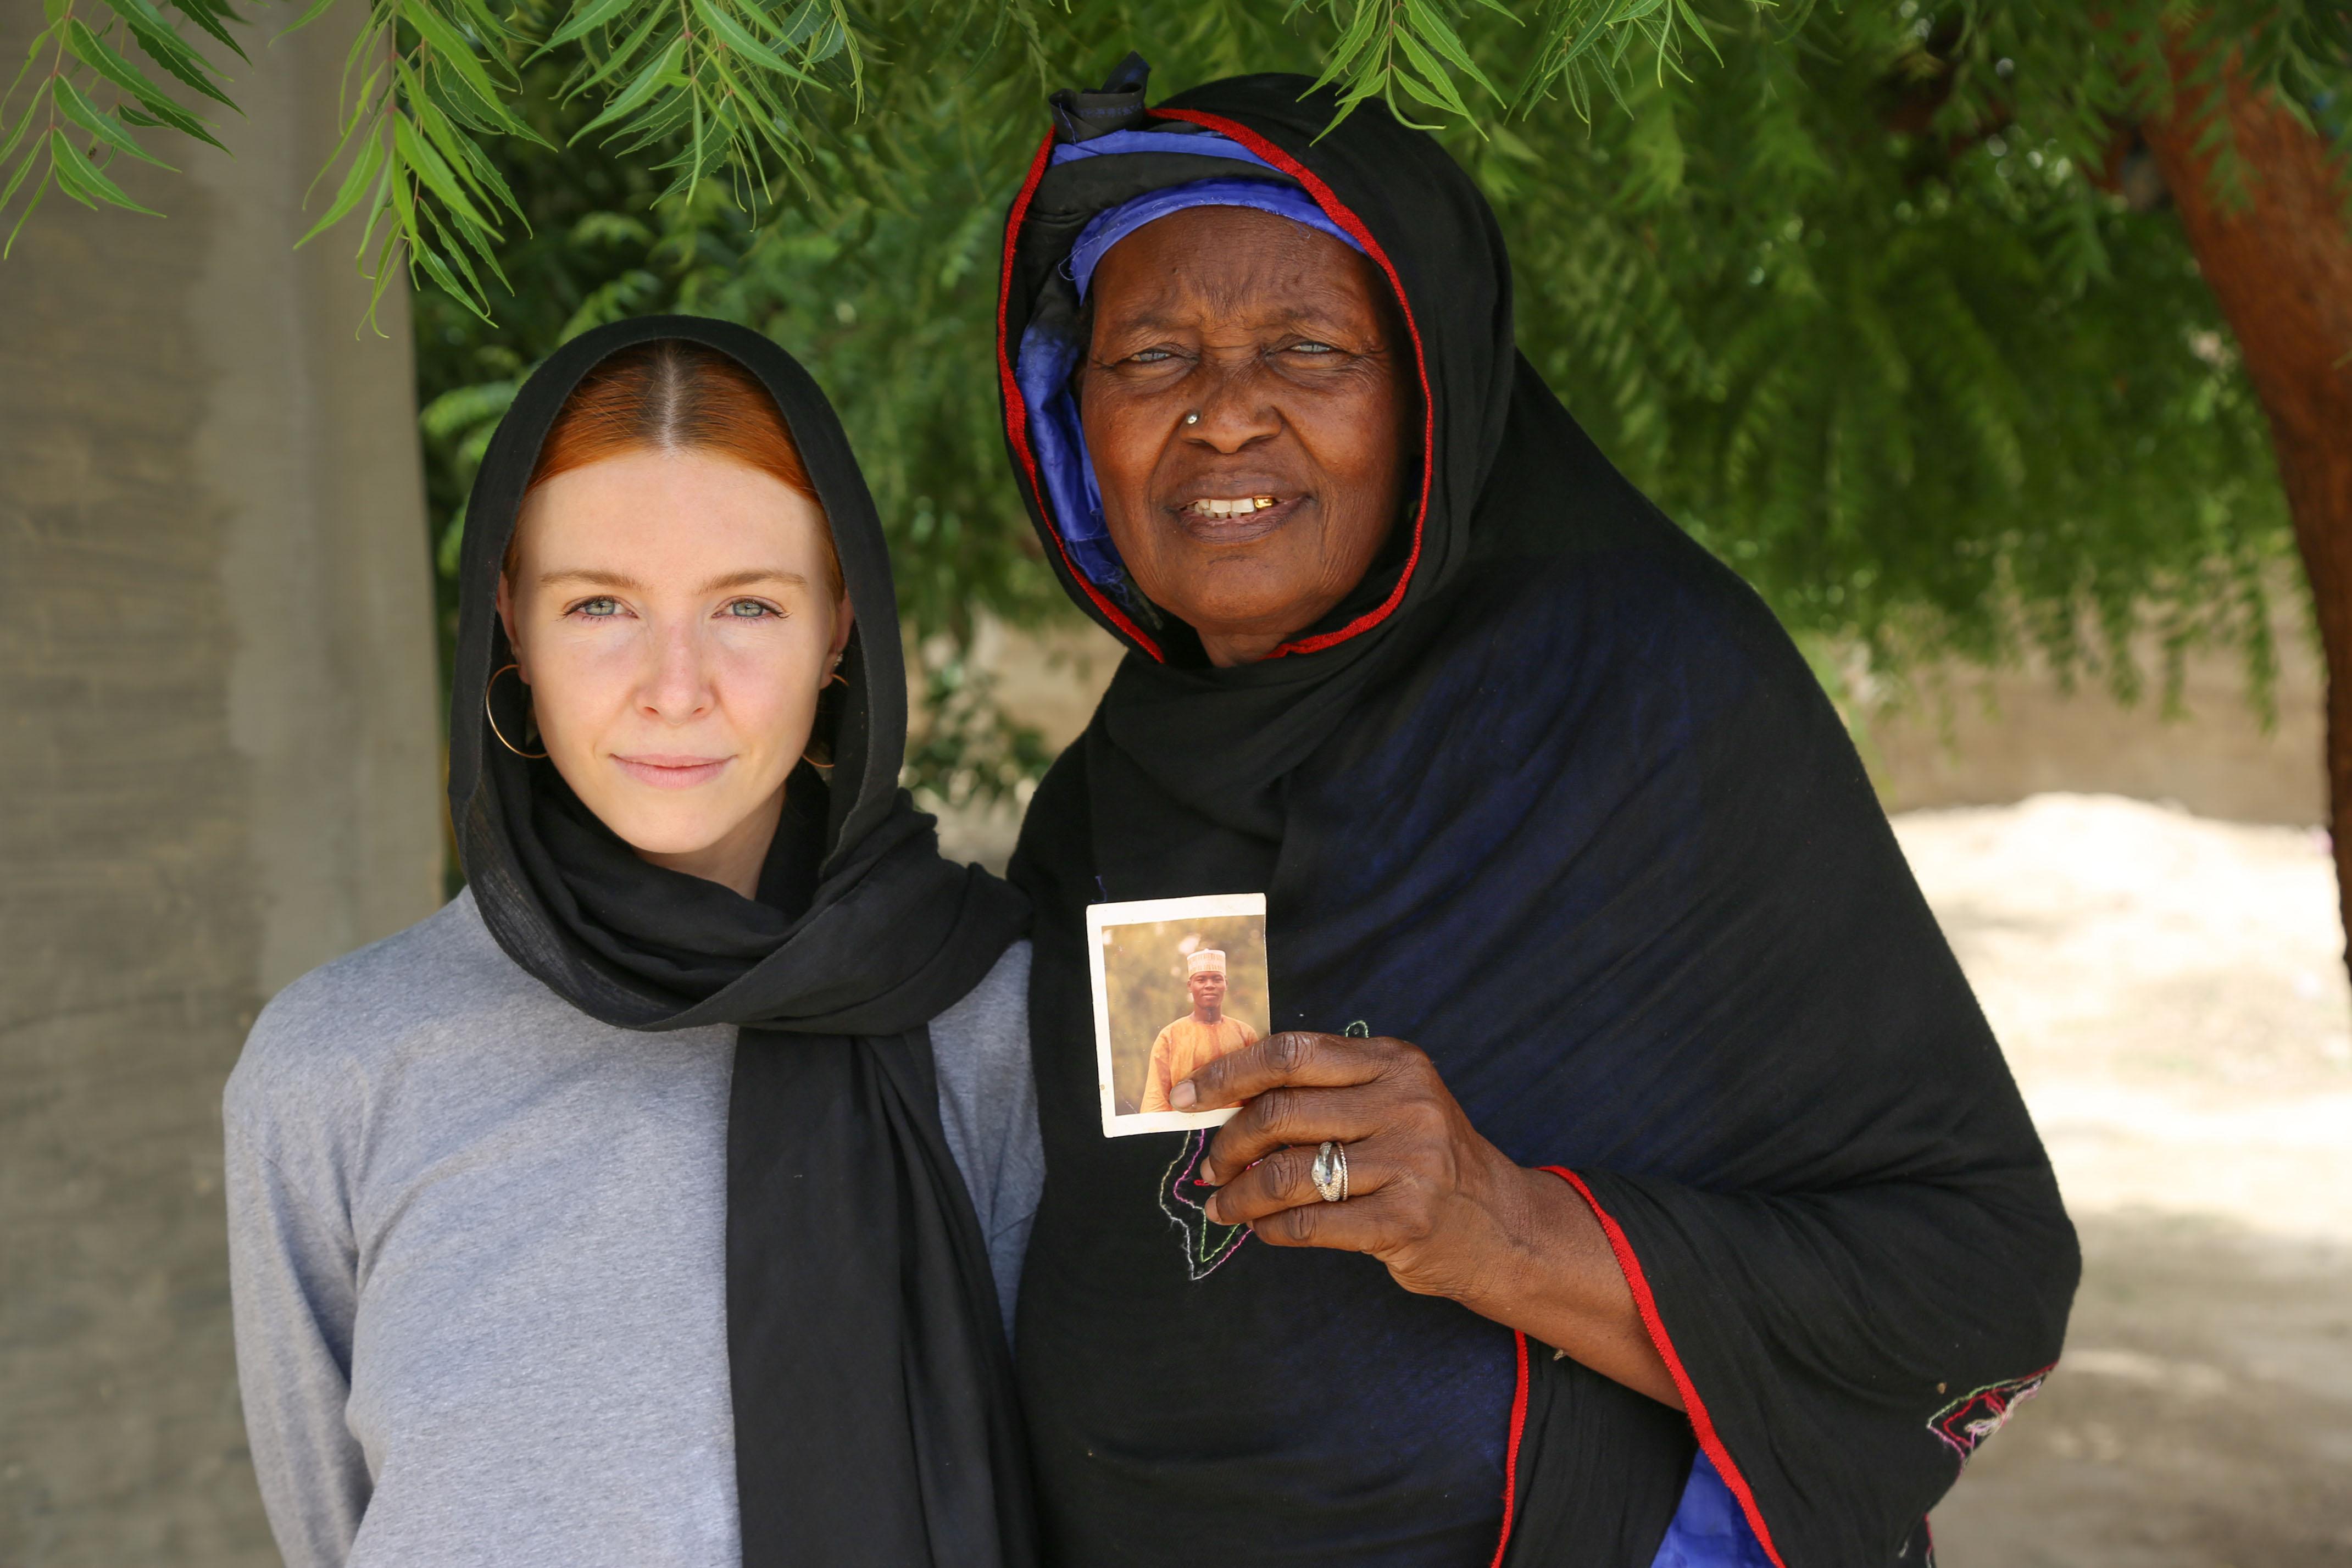 Stacey Dooley Investigates: Nigeria's Female Suicide Bombers